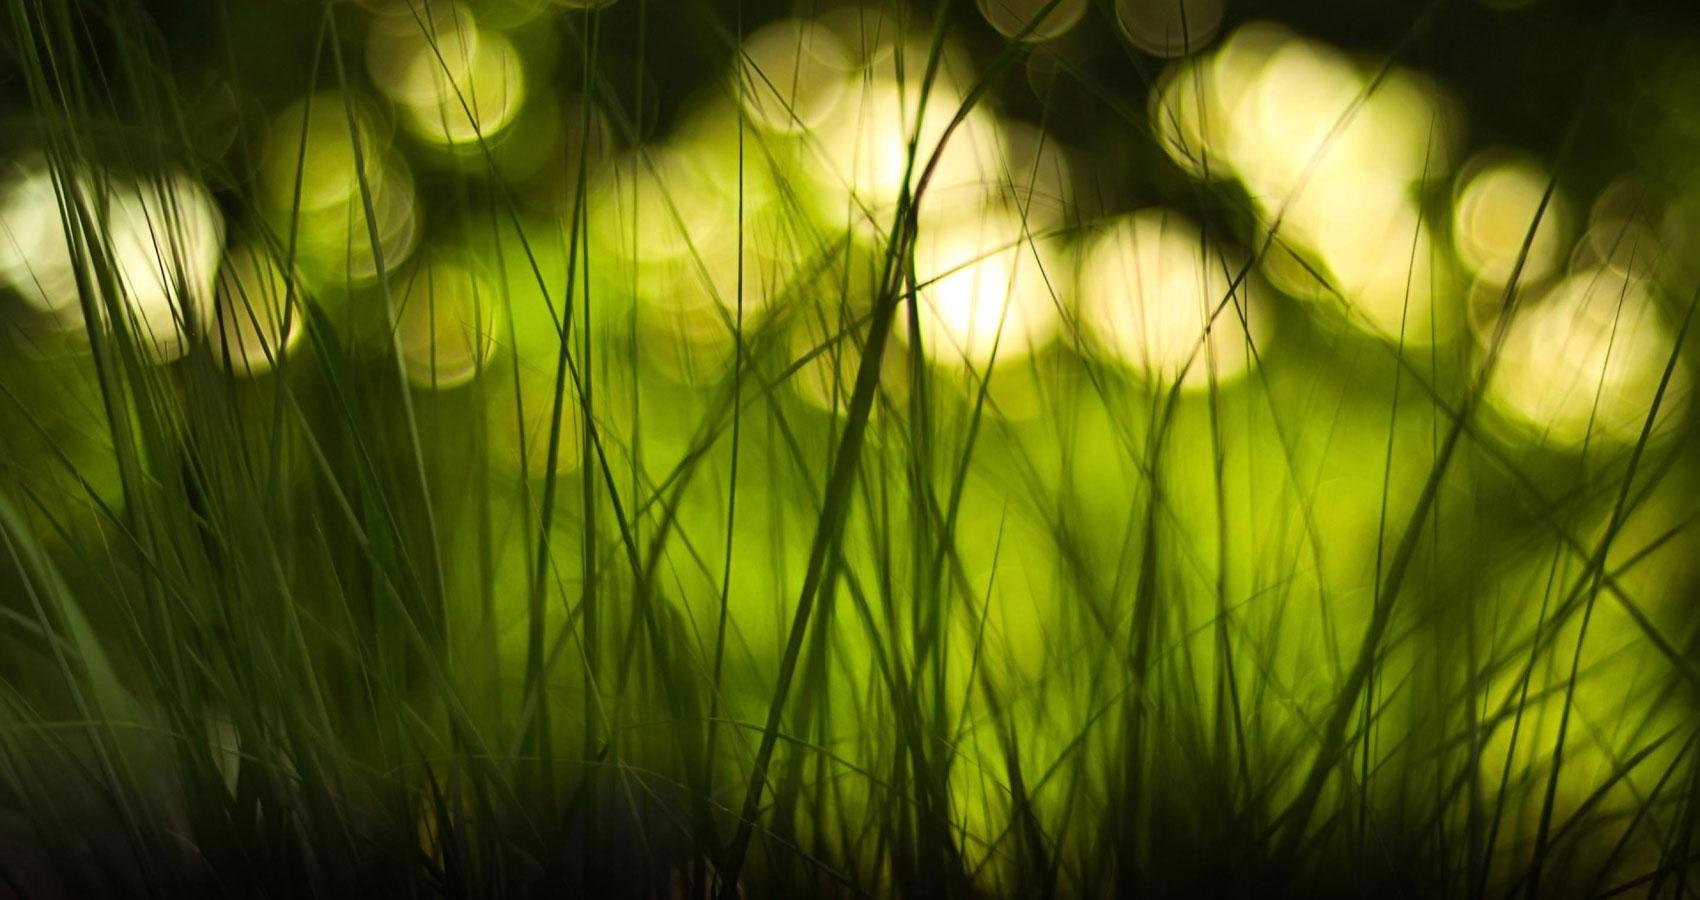 Spire Grass Ripples by Freya Pickard at Spillwords.com